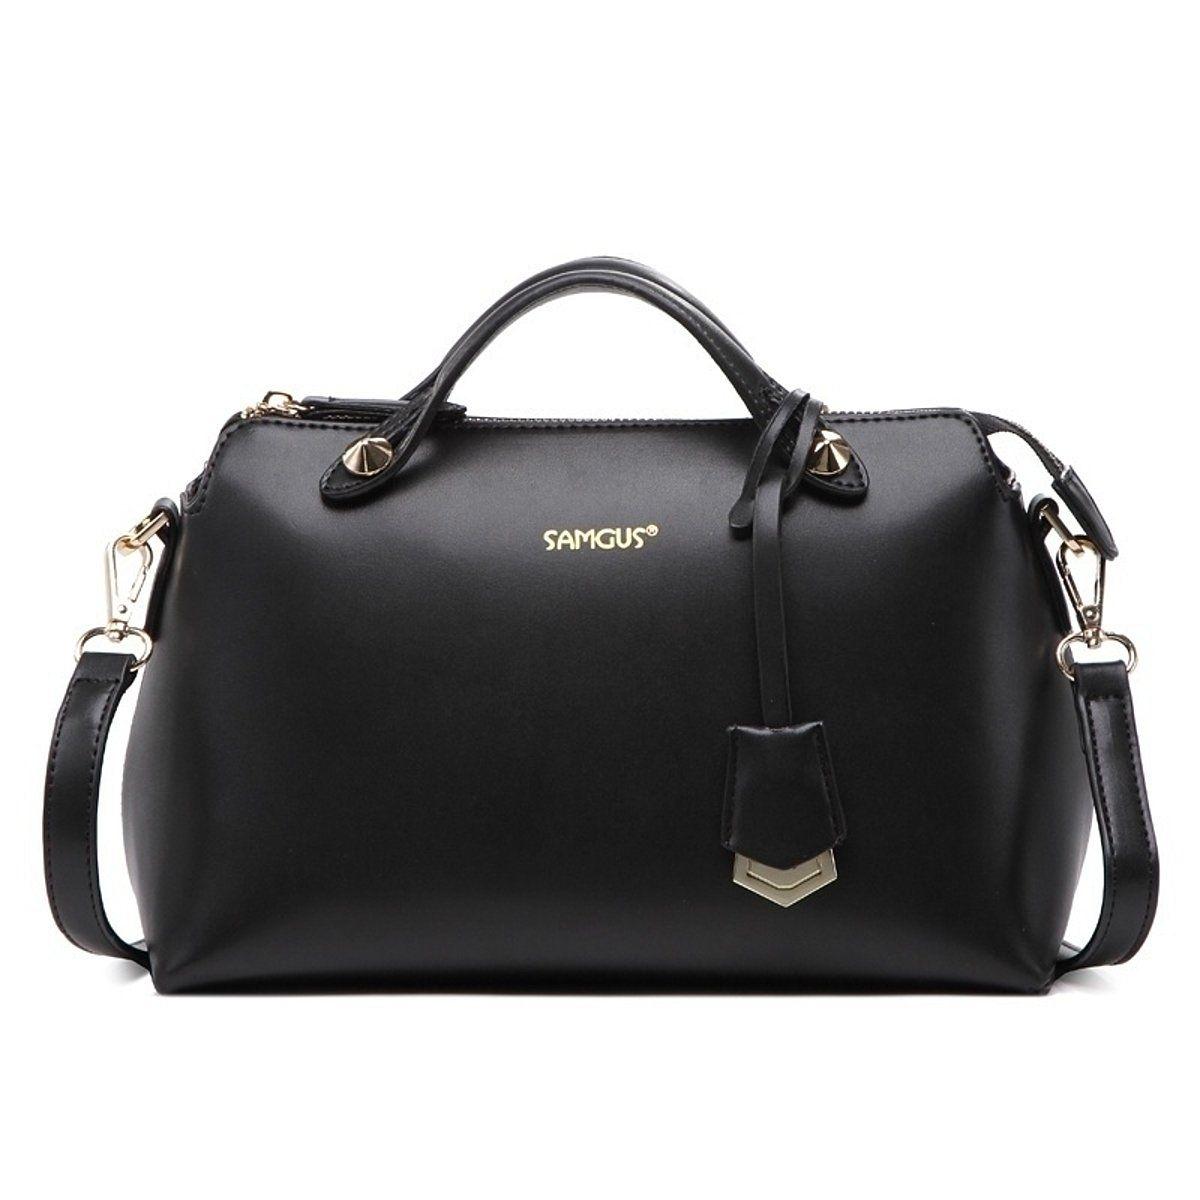 f0480778404 New arrival Stylish Atmosphere Bowling Bag Shoulder Bag Women ...